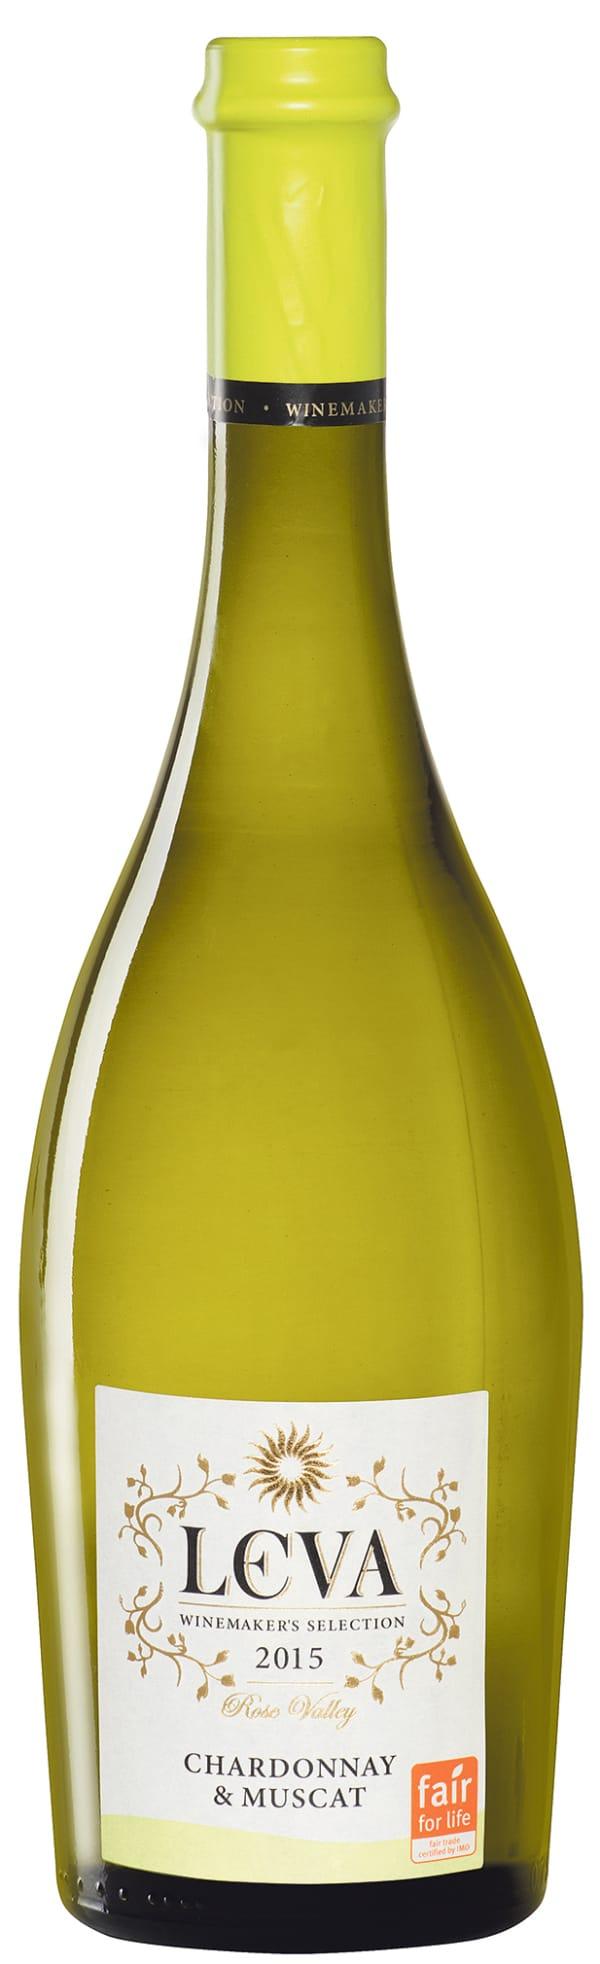 Leva Chardonnay Muscat 2015